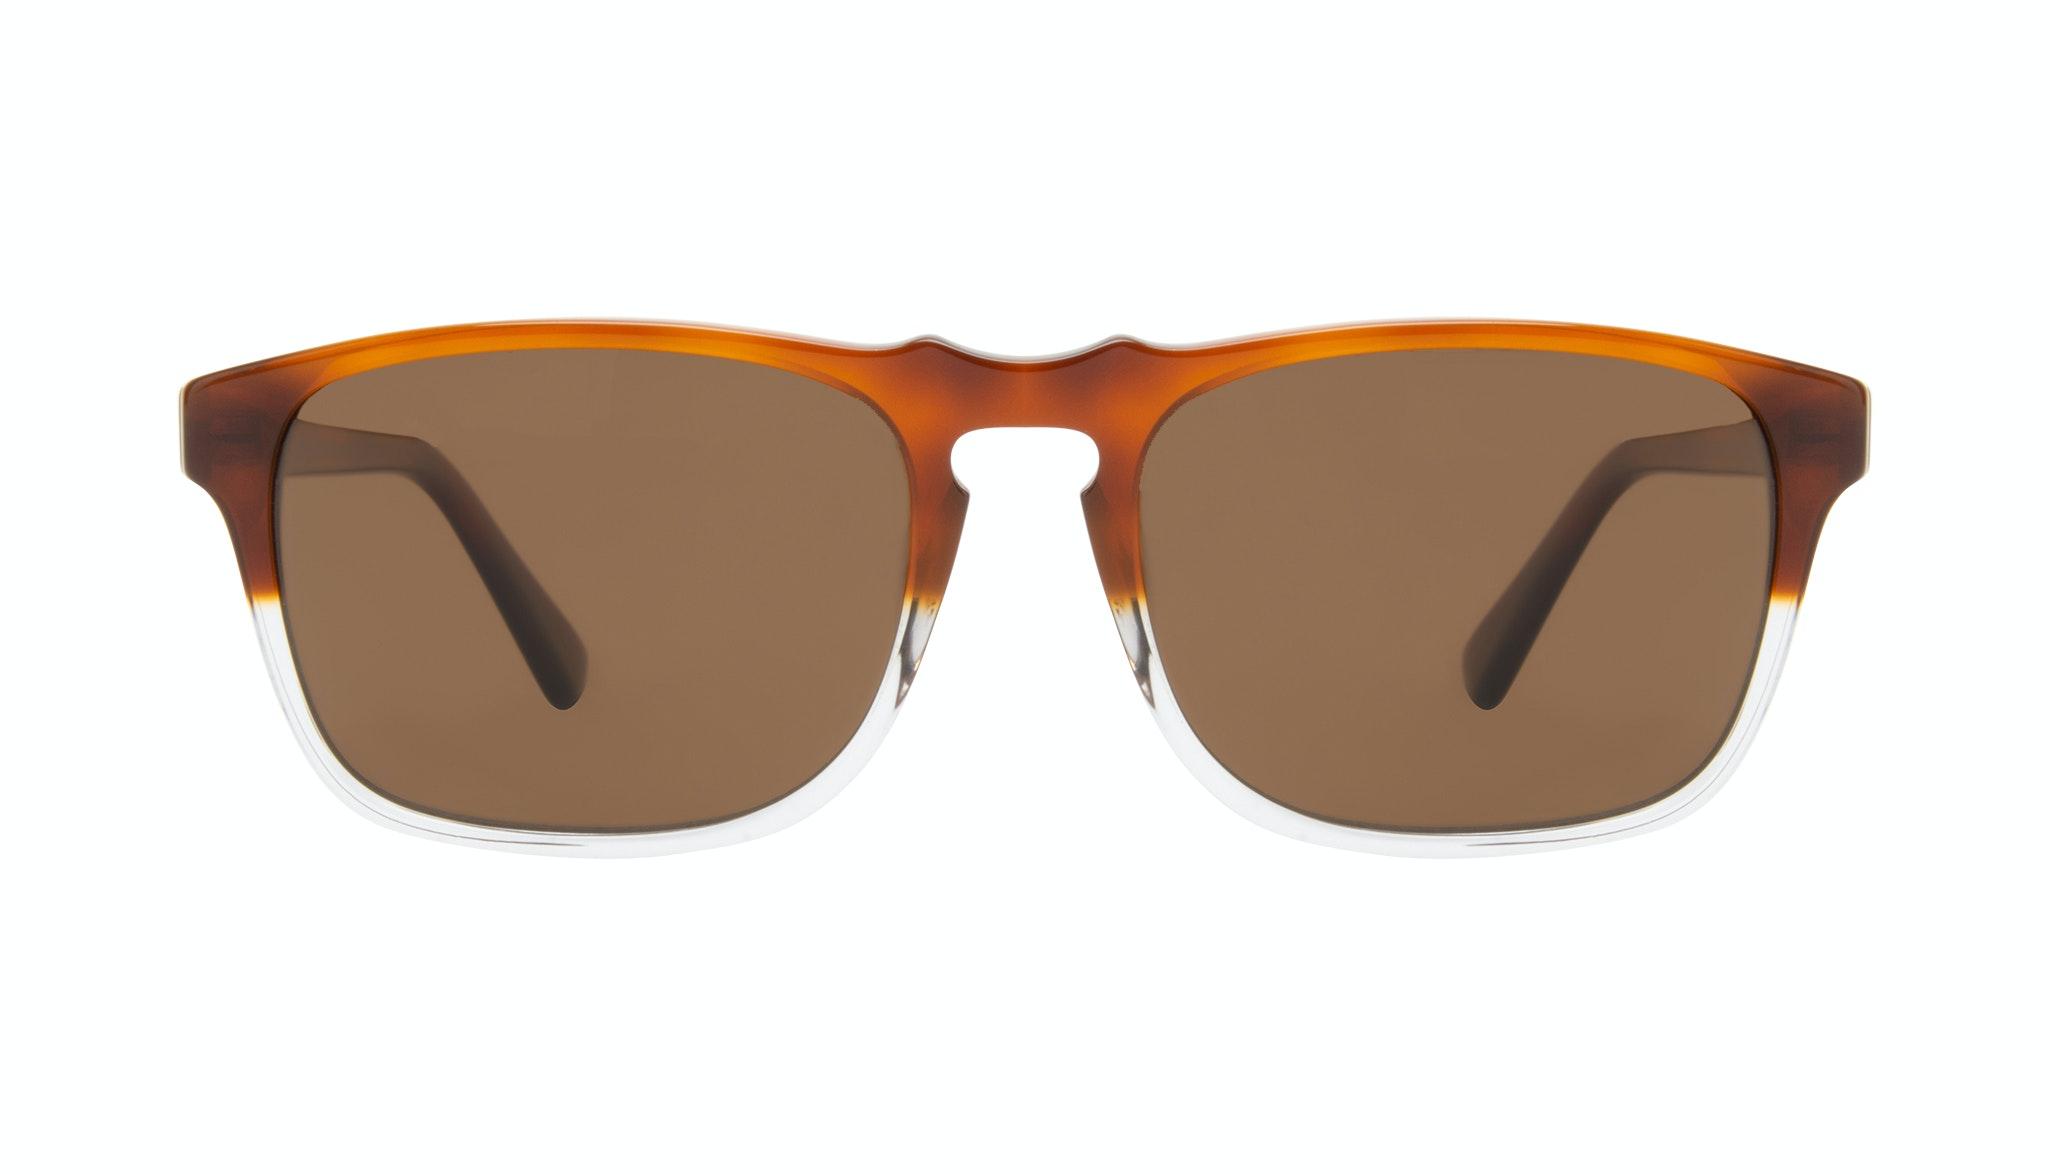 Affordable Fashion Glasses Square Sunglasses Men Raceway Havana Clear Front